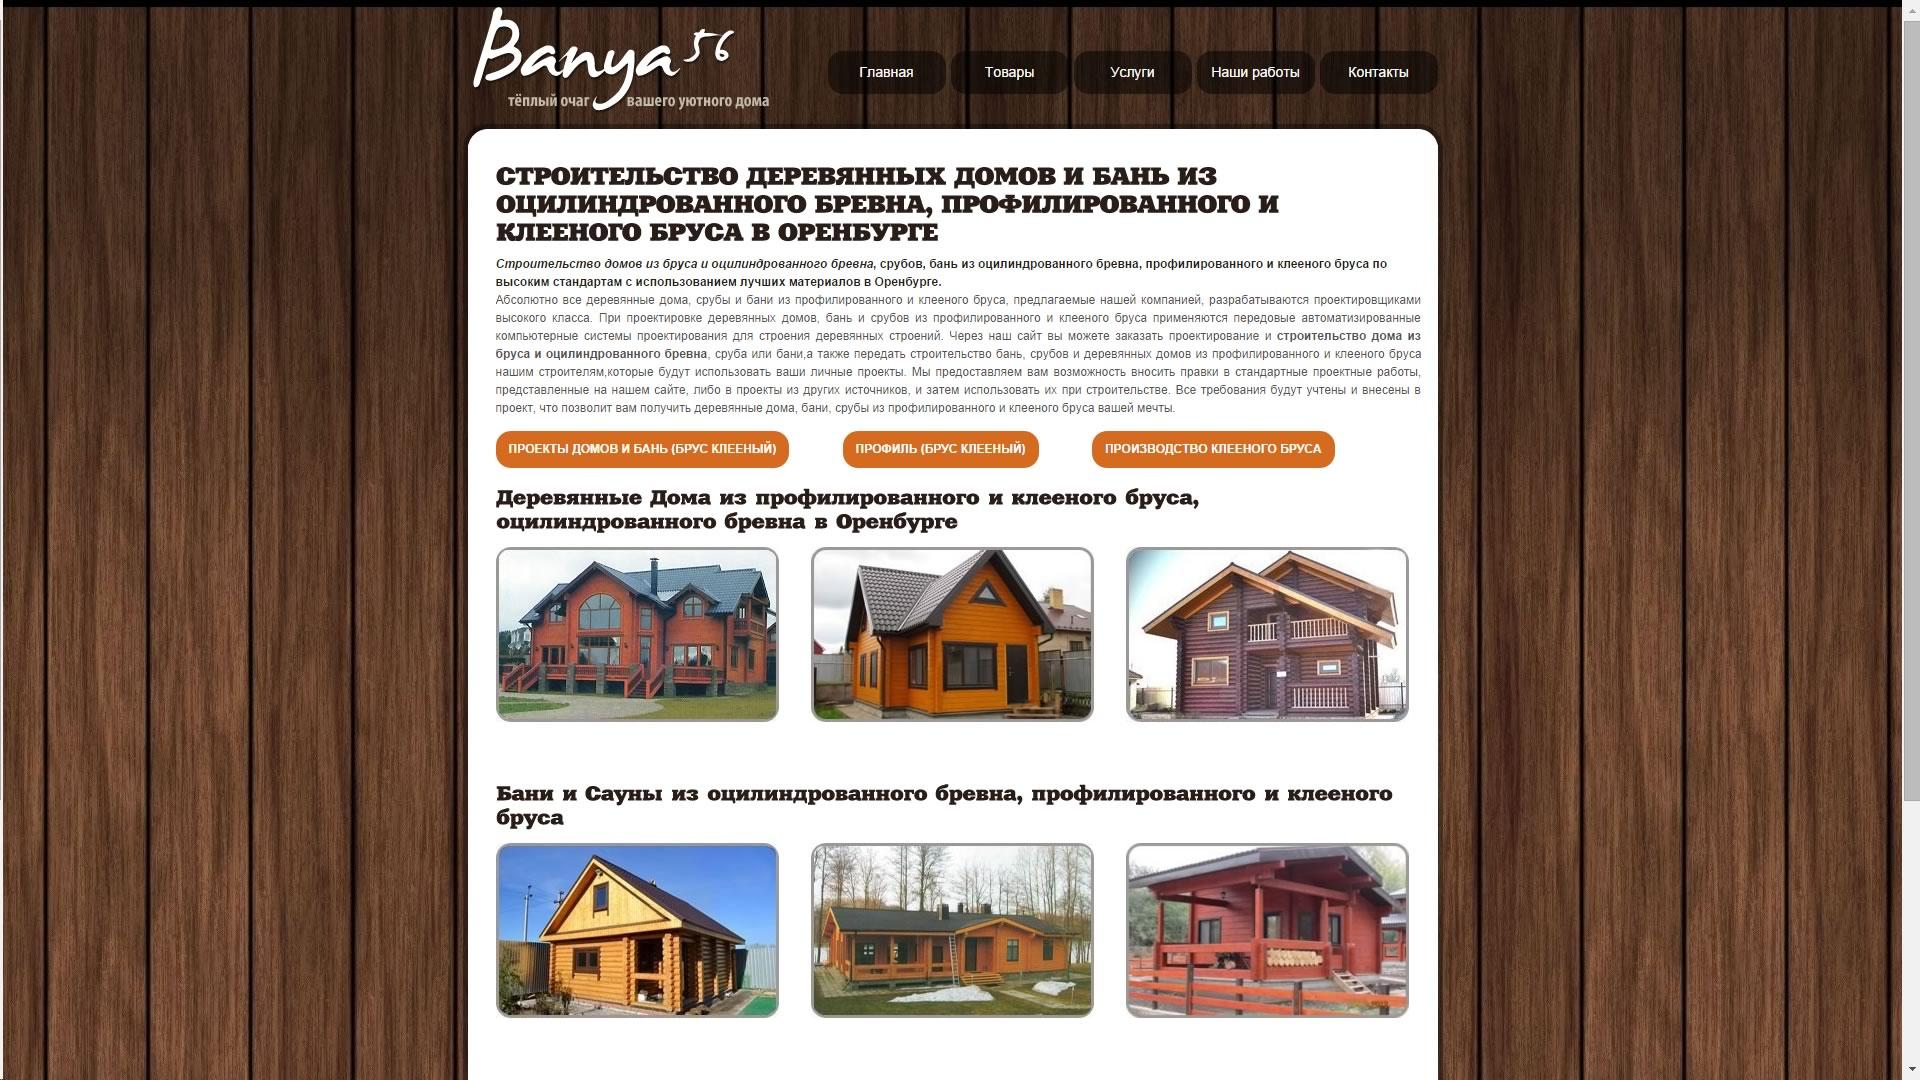 Создание сайта banya56.ru (13)